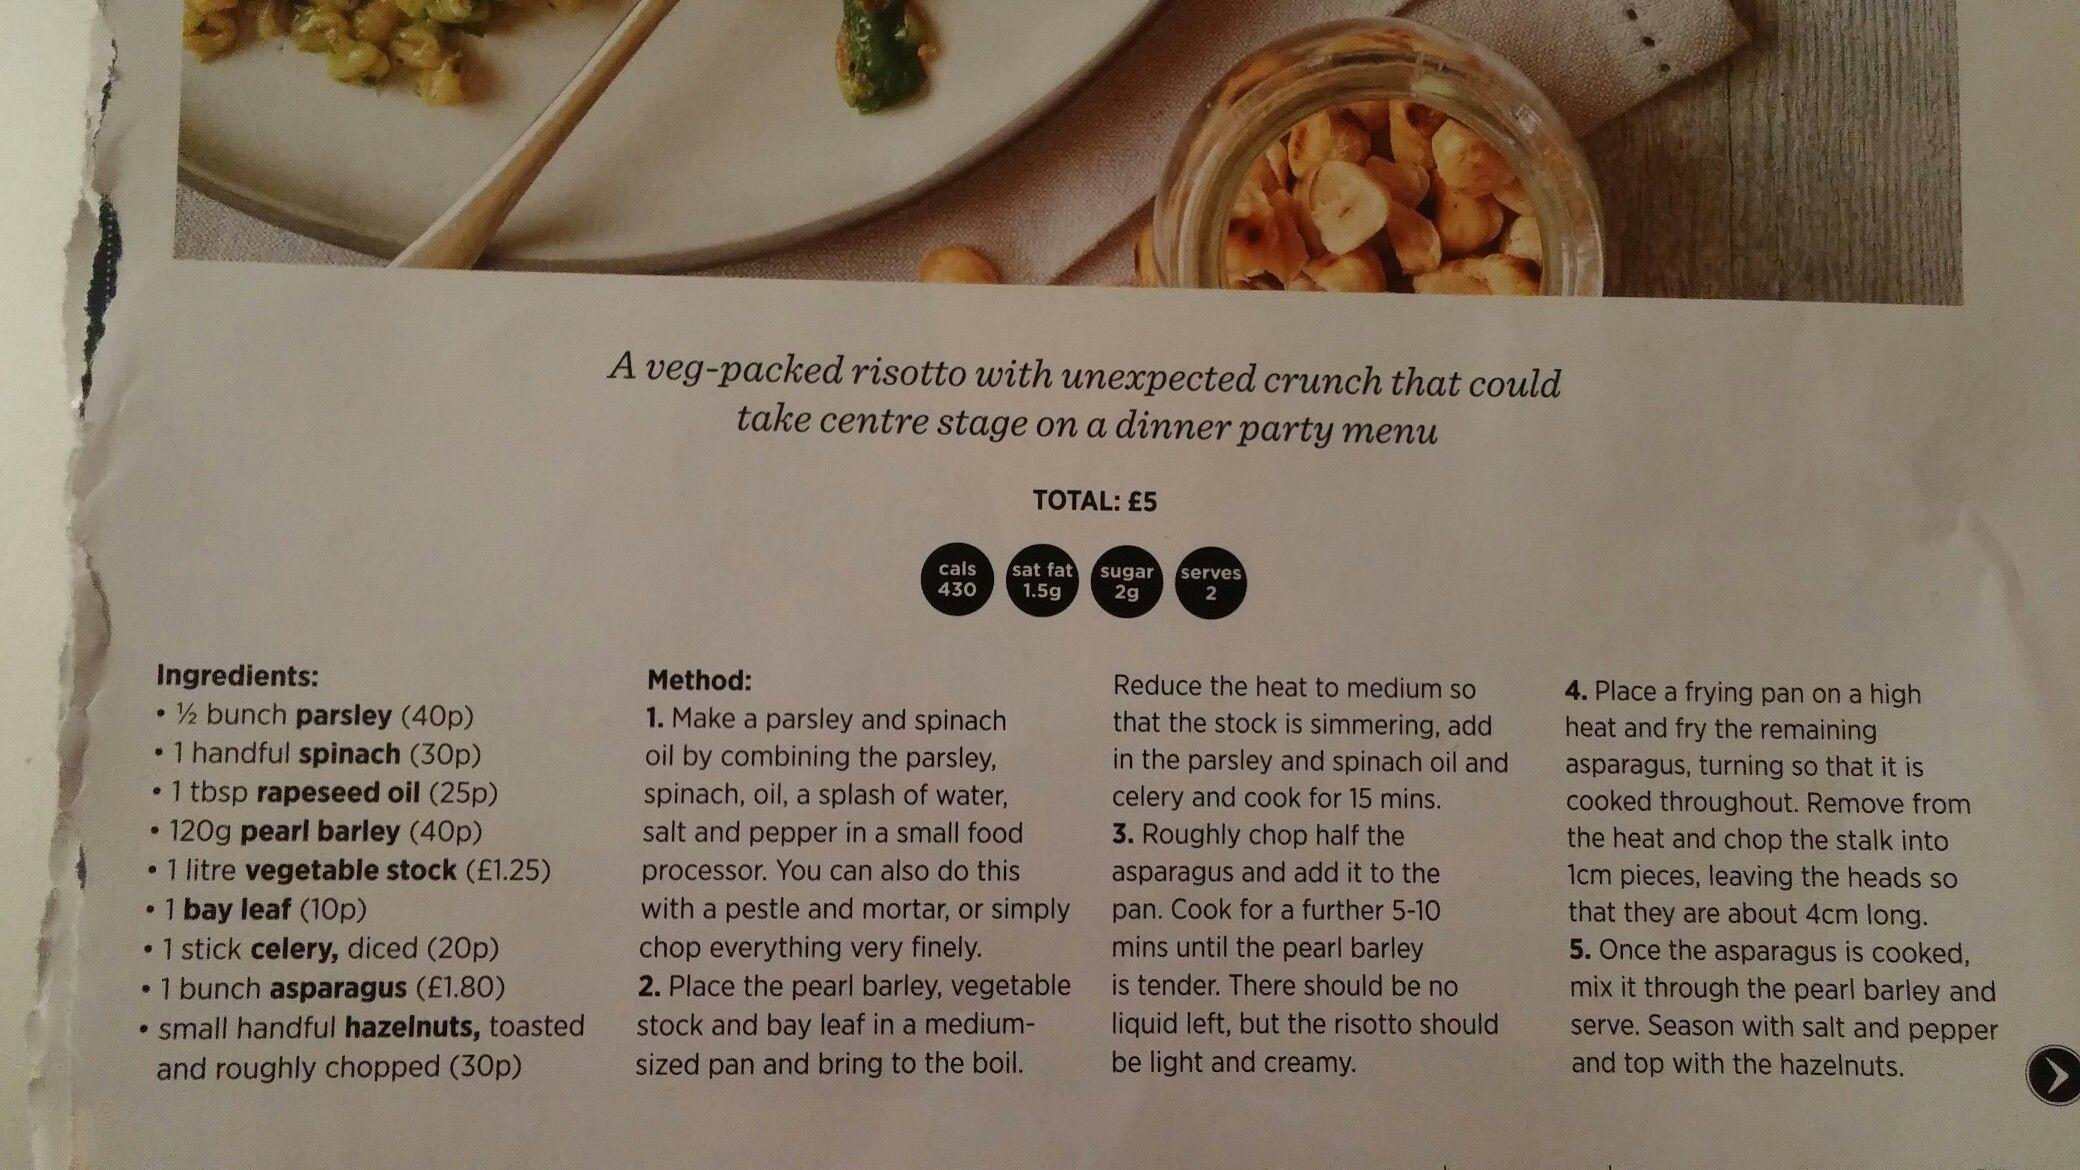 Asparagus and pearl batley risotto